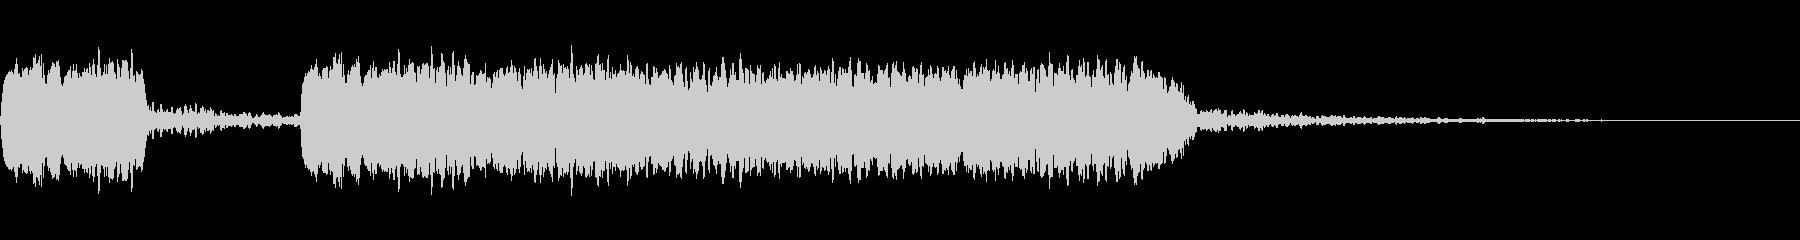 【Foley】笛/ホイッスル/サンバの未再生の波形